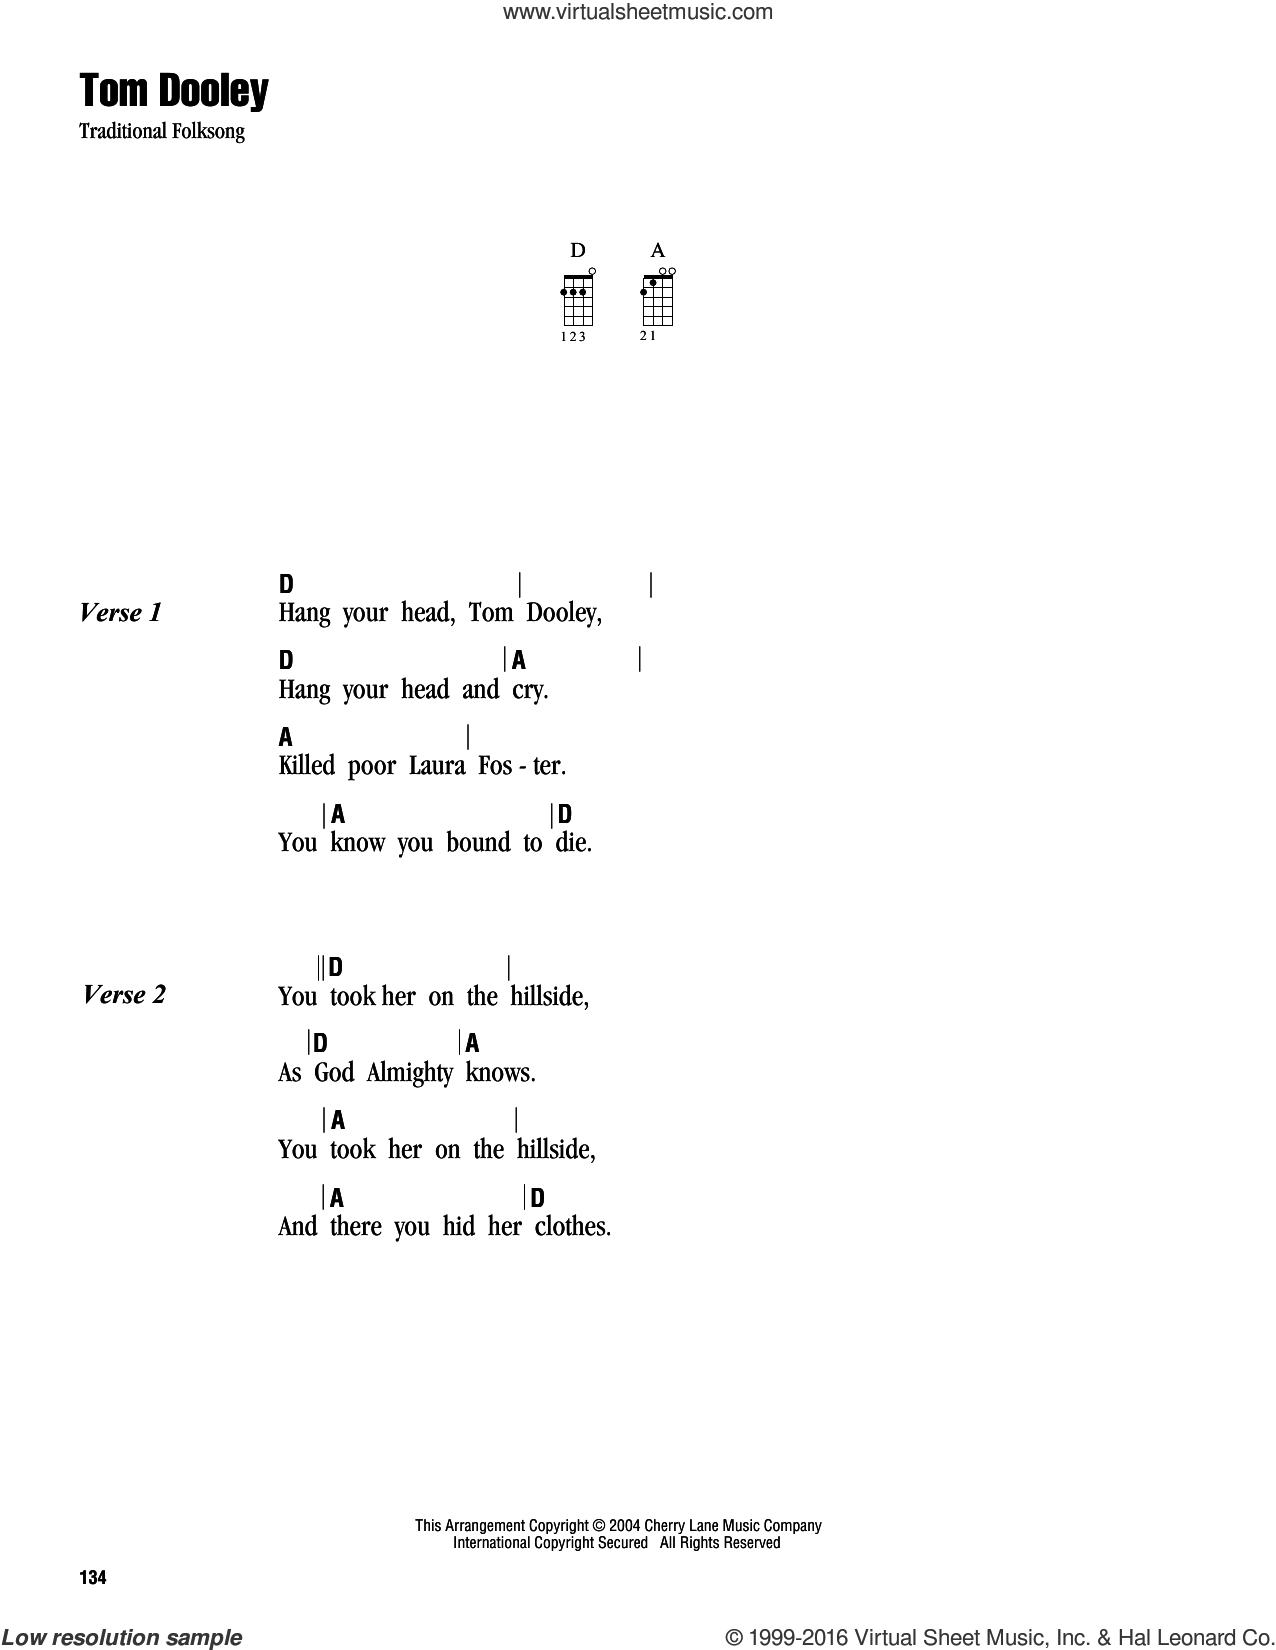 Tom Dooley sheet music for ukulele (chords), intermediate skill level